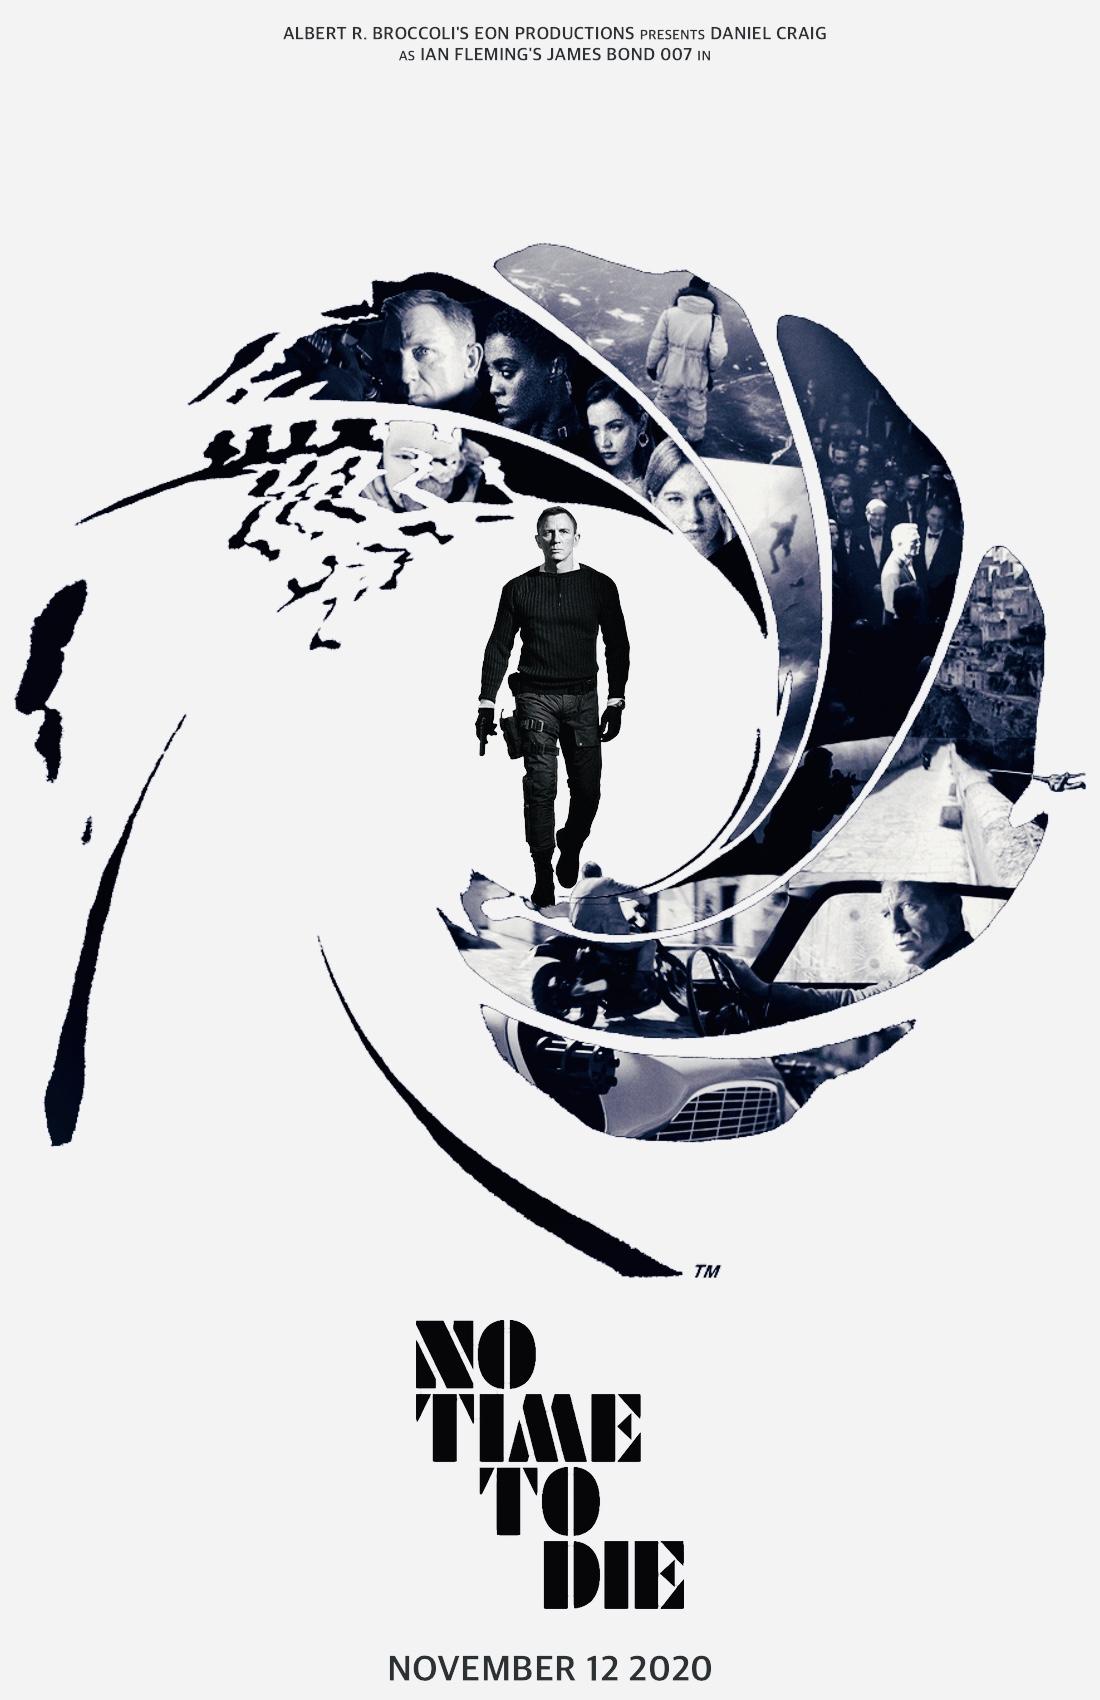 no-time-to-die-gunb-poster-1b-1.jpg